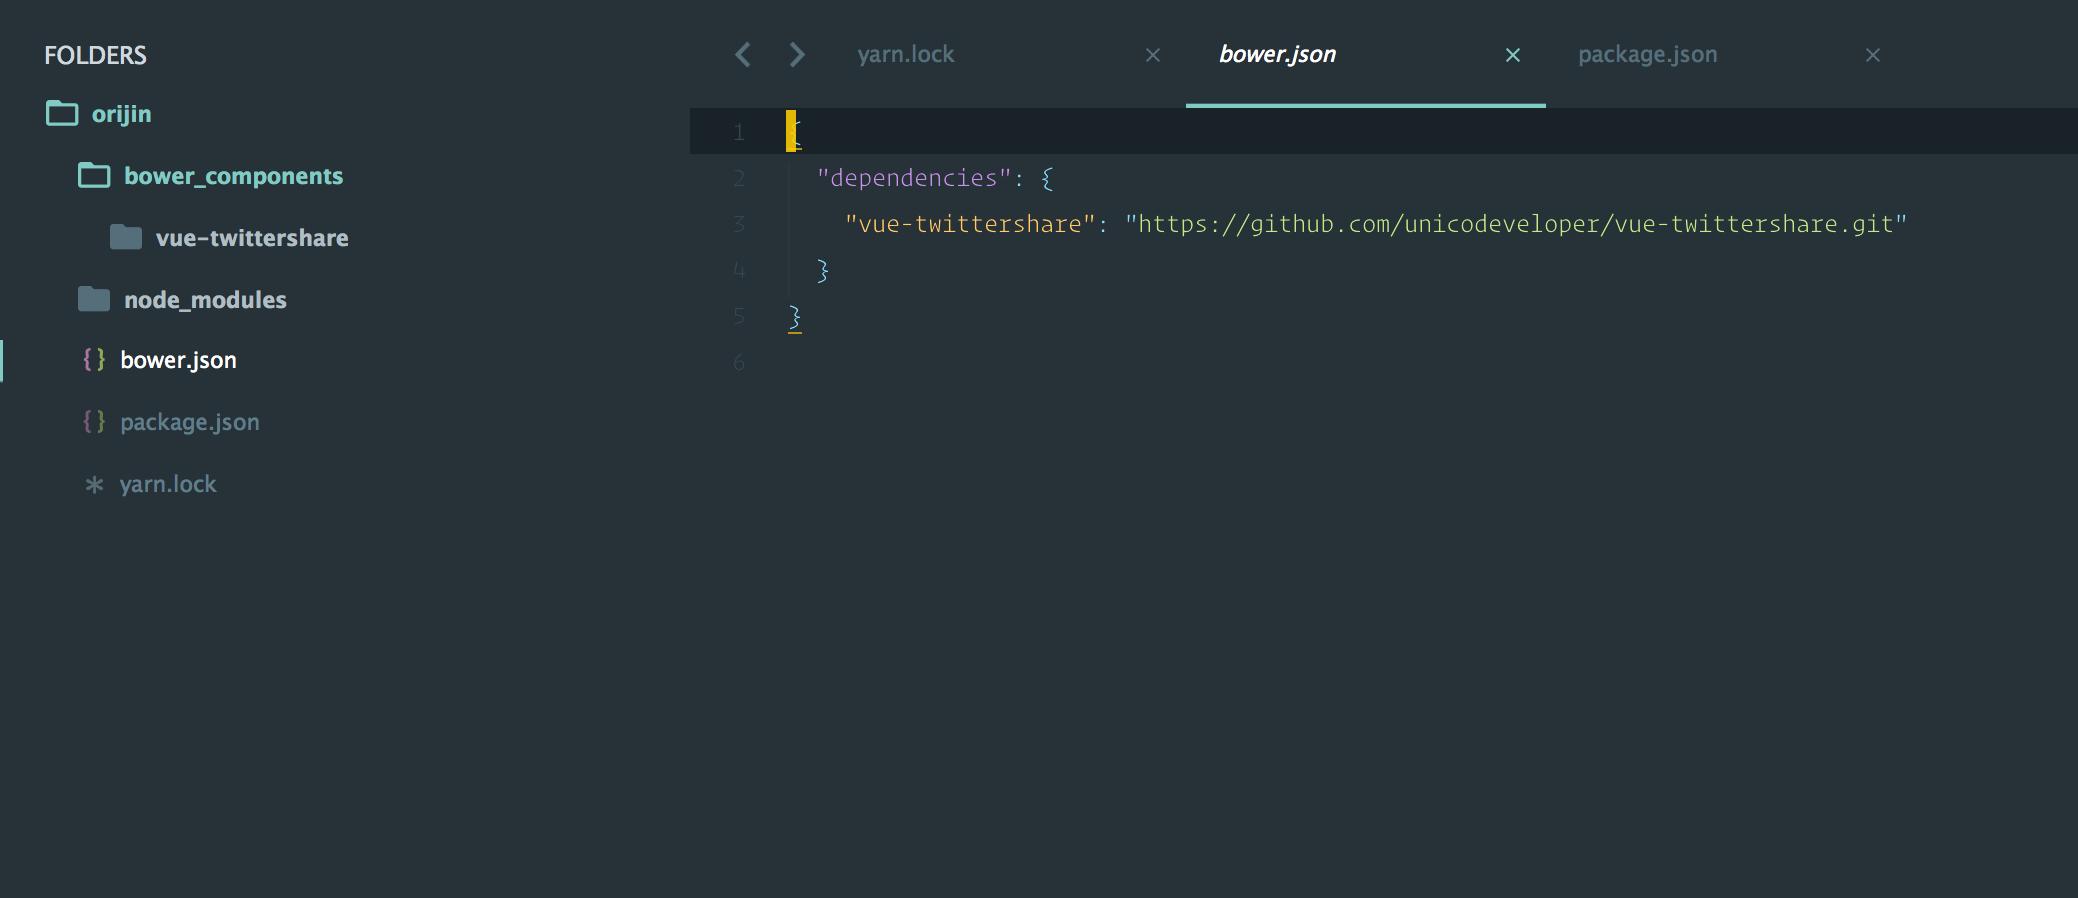 Yarn 检测到在 bower 源存在 Github Rep